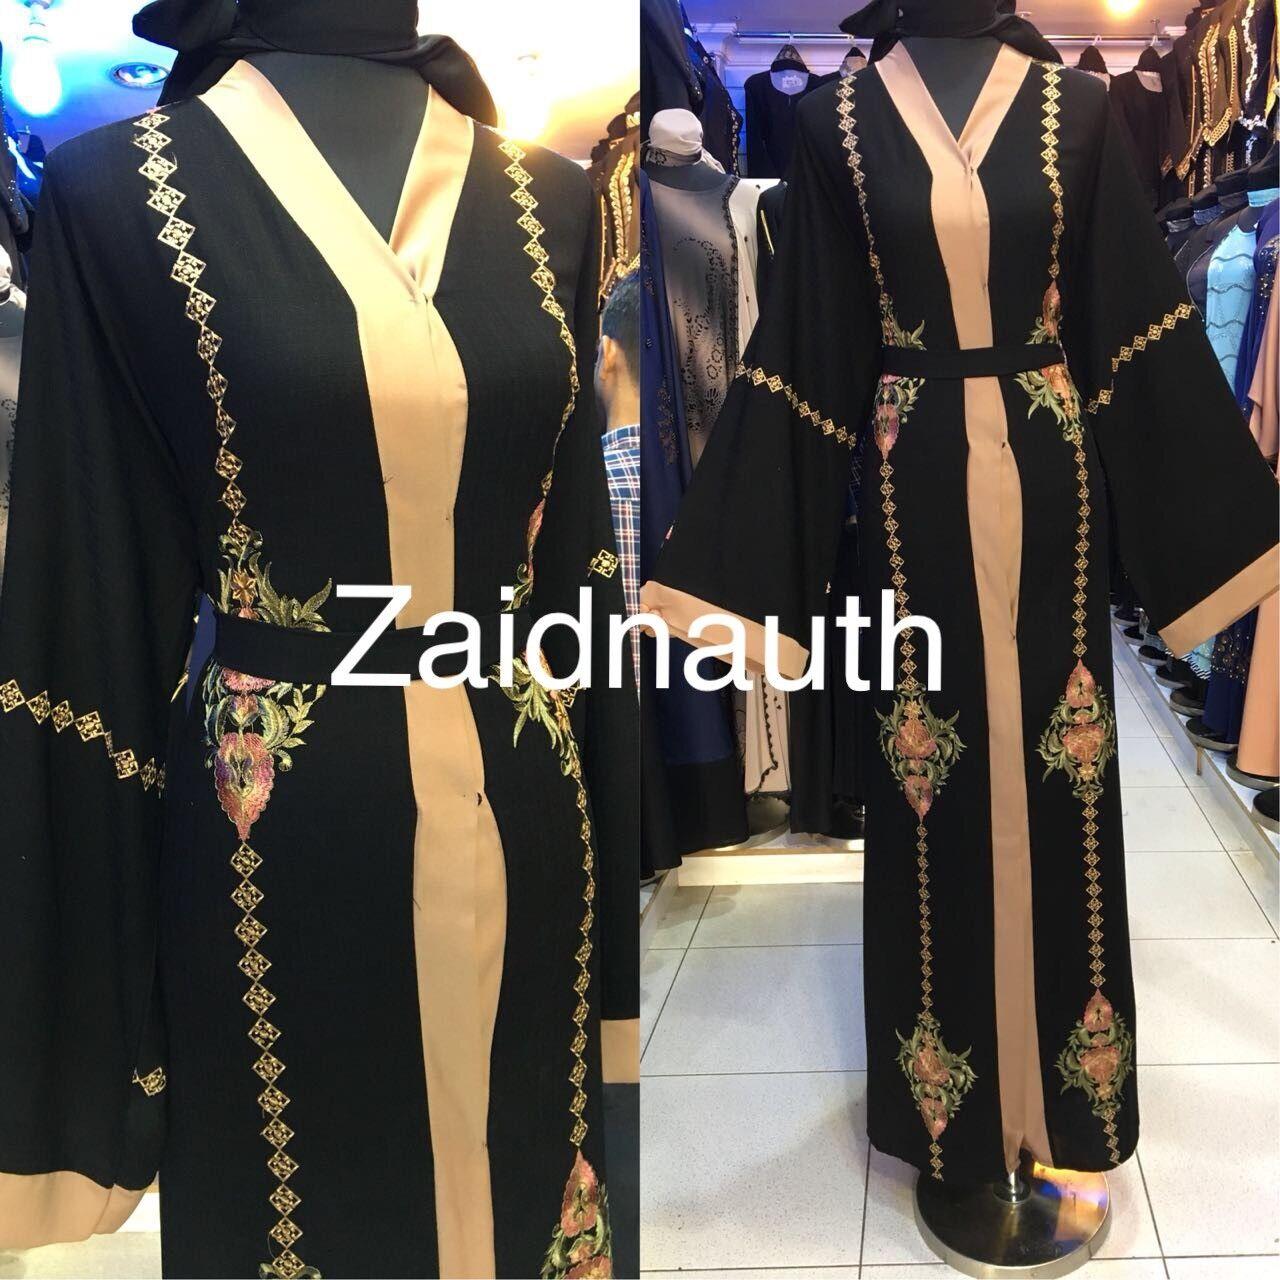 New open front abayas abayas abayas dress islamic wear saudi women dress.size 54.&56 2018 3bd400